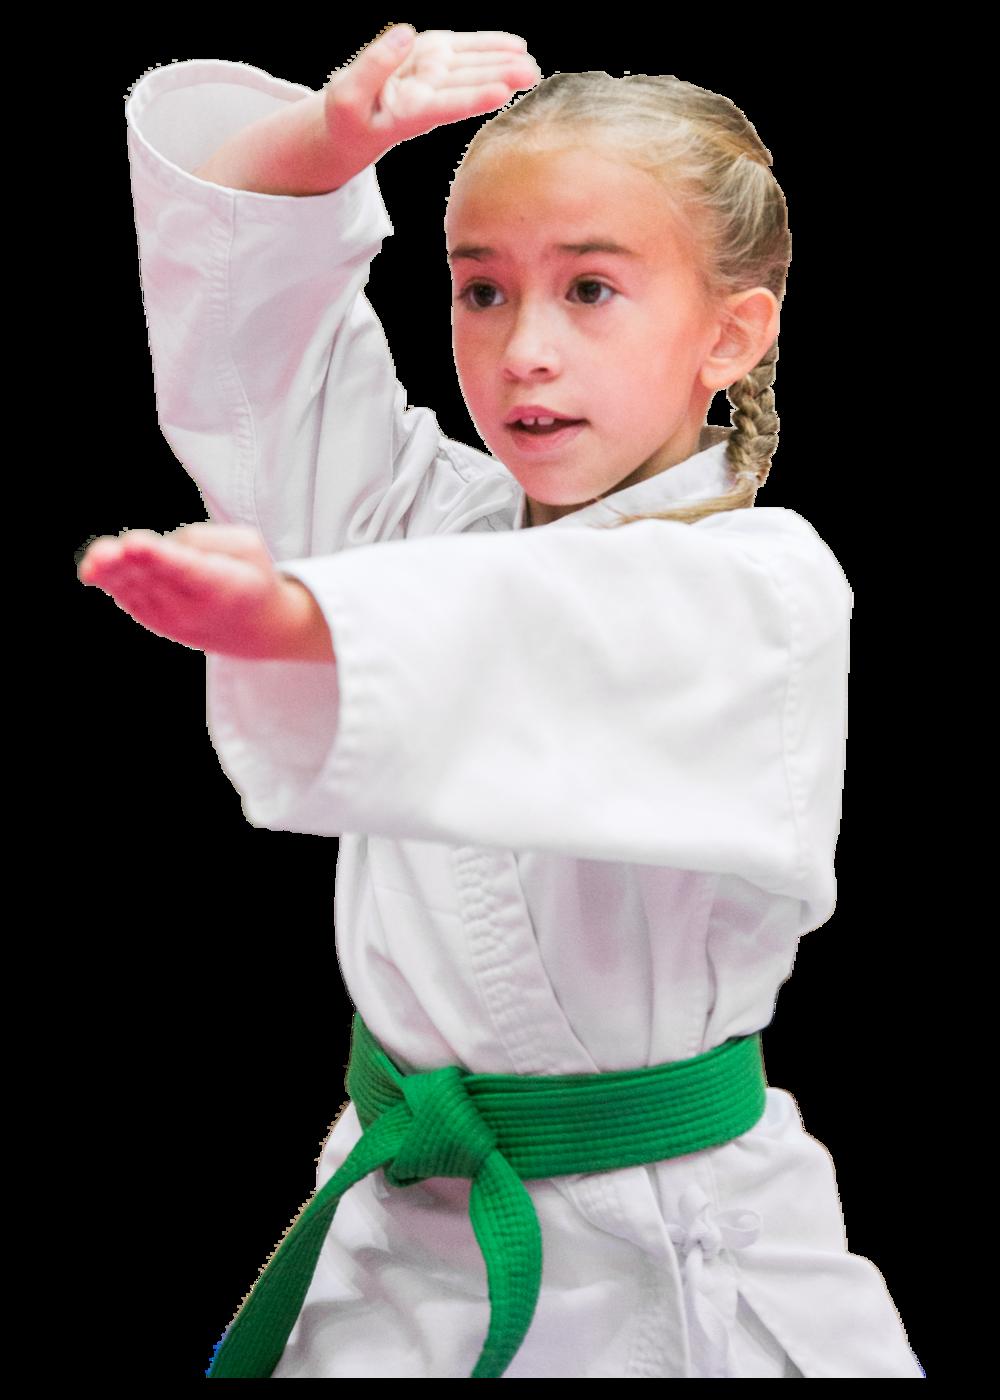 Green Belt Girl.png